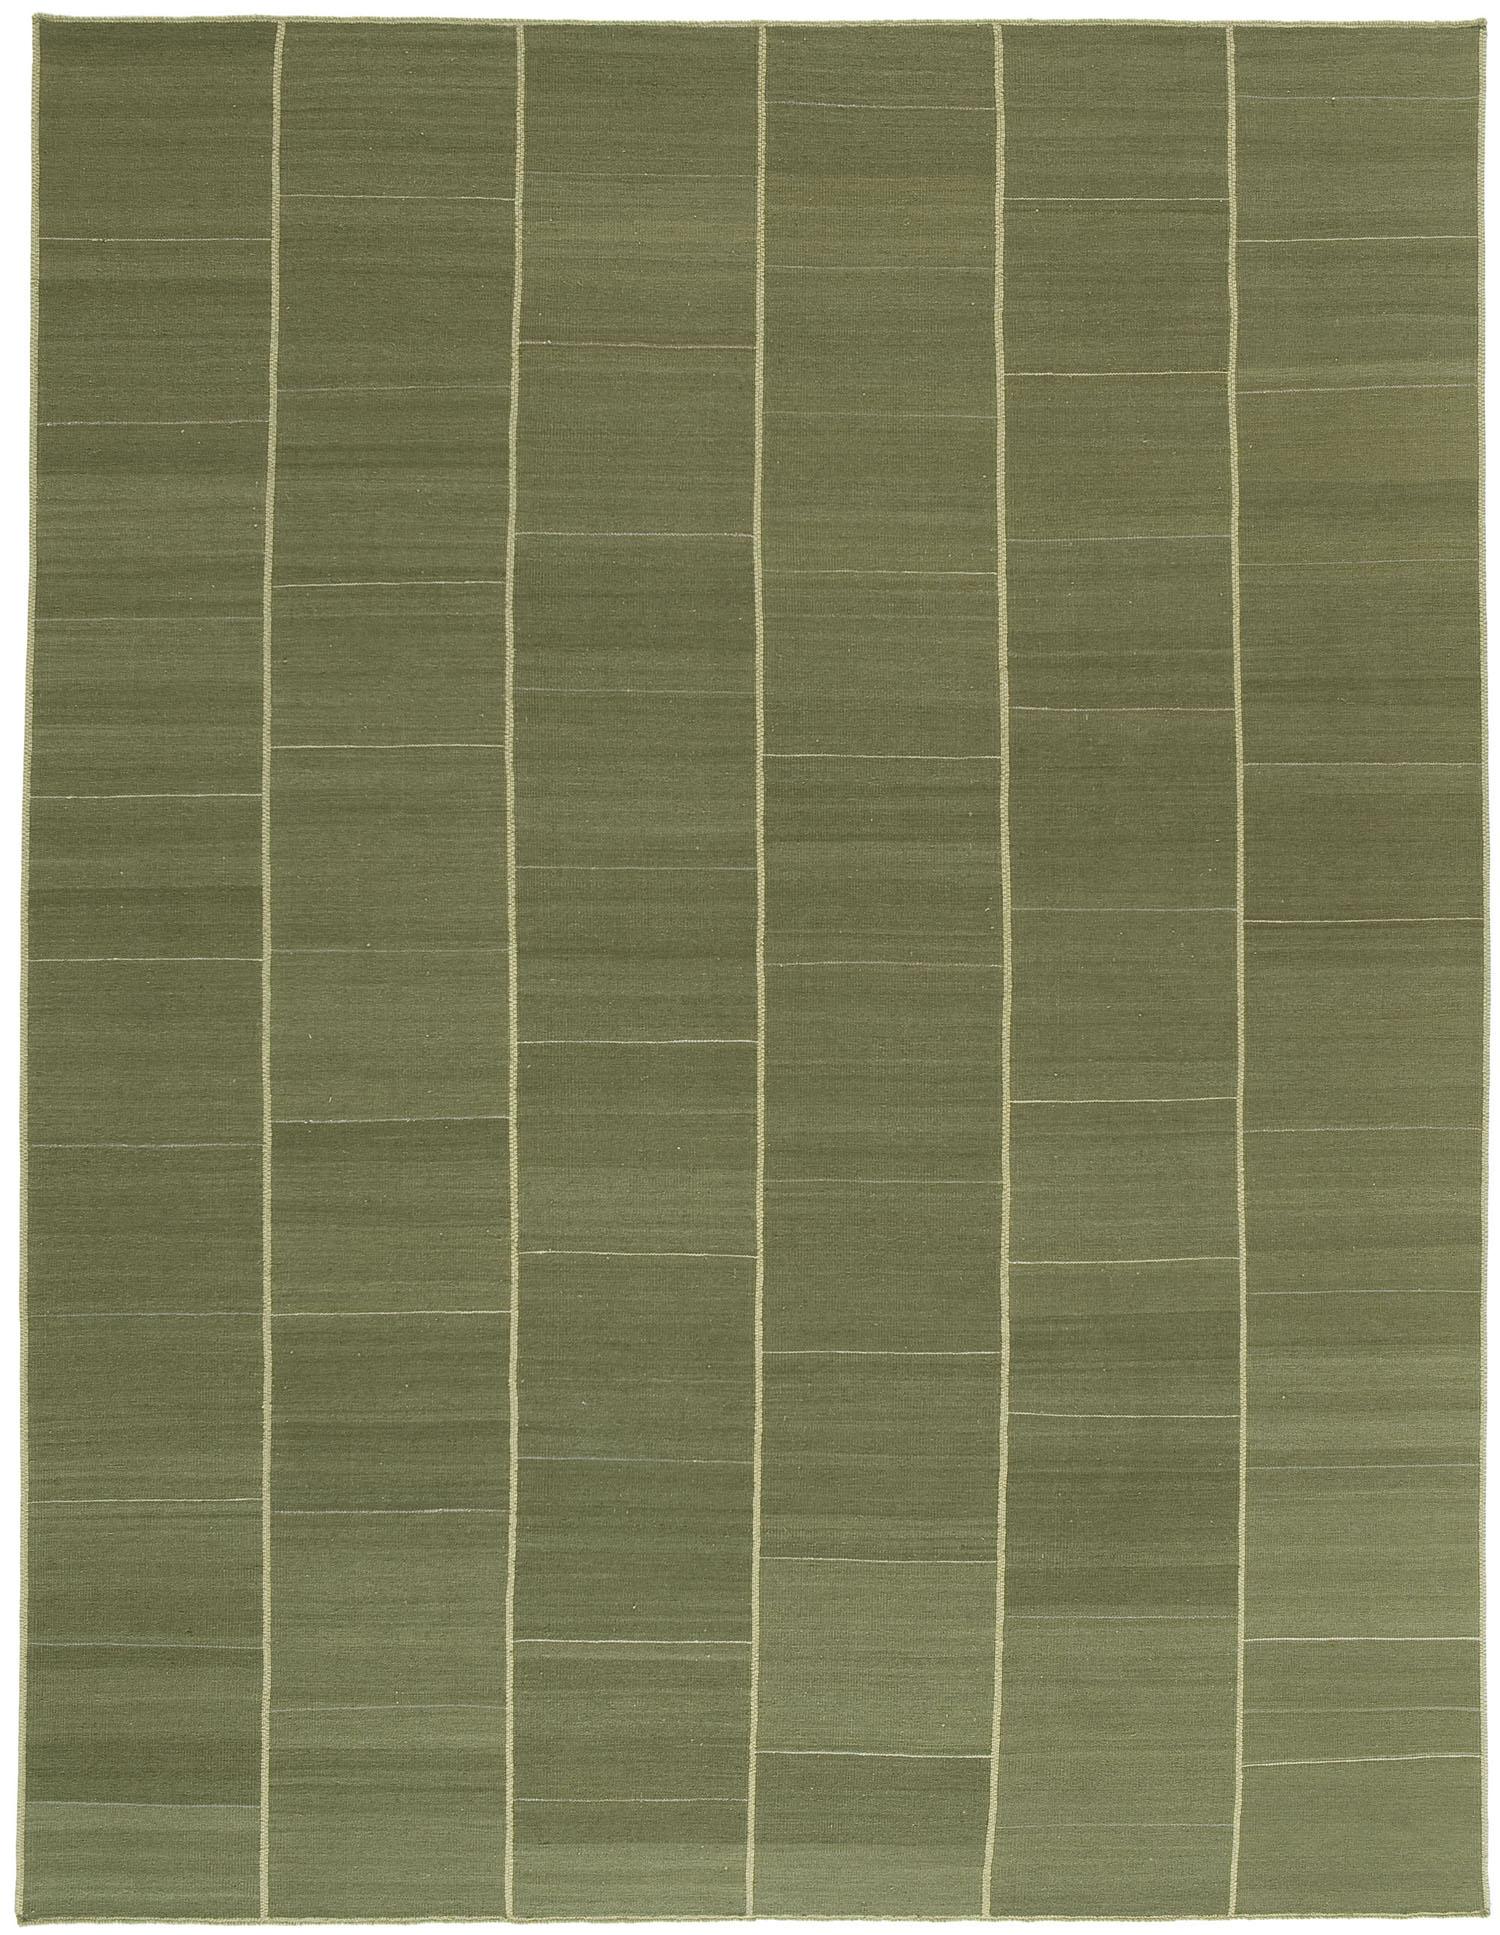 Jijim, Oonah III, green, 3G17 9.3x12.jpg